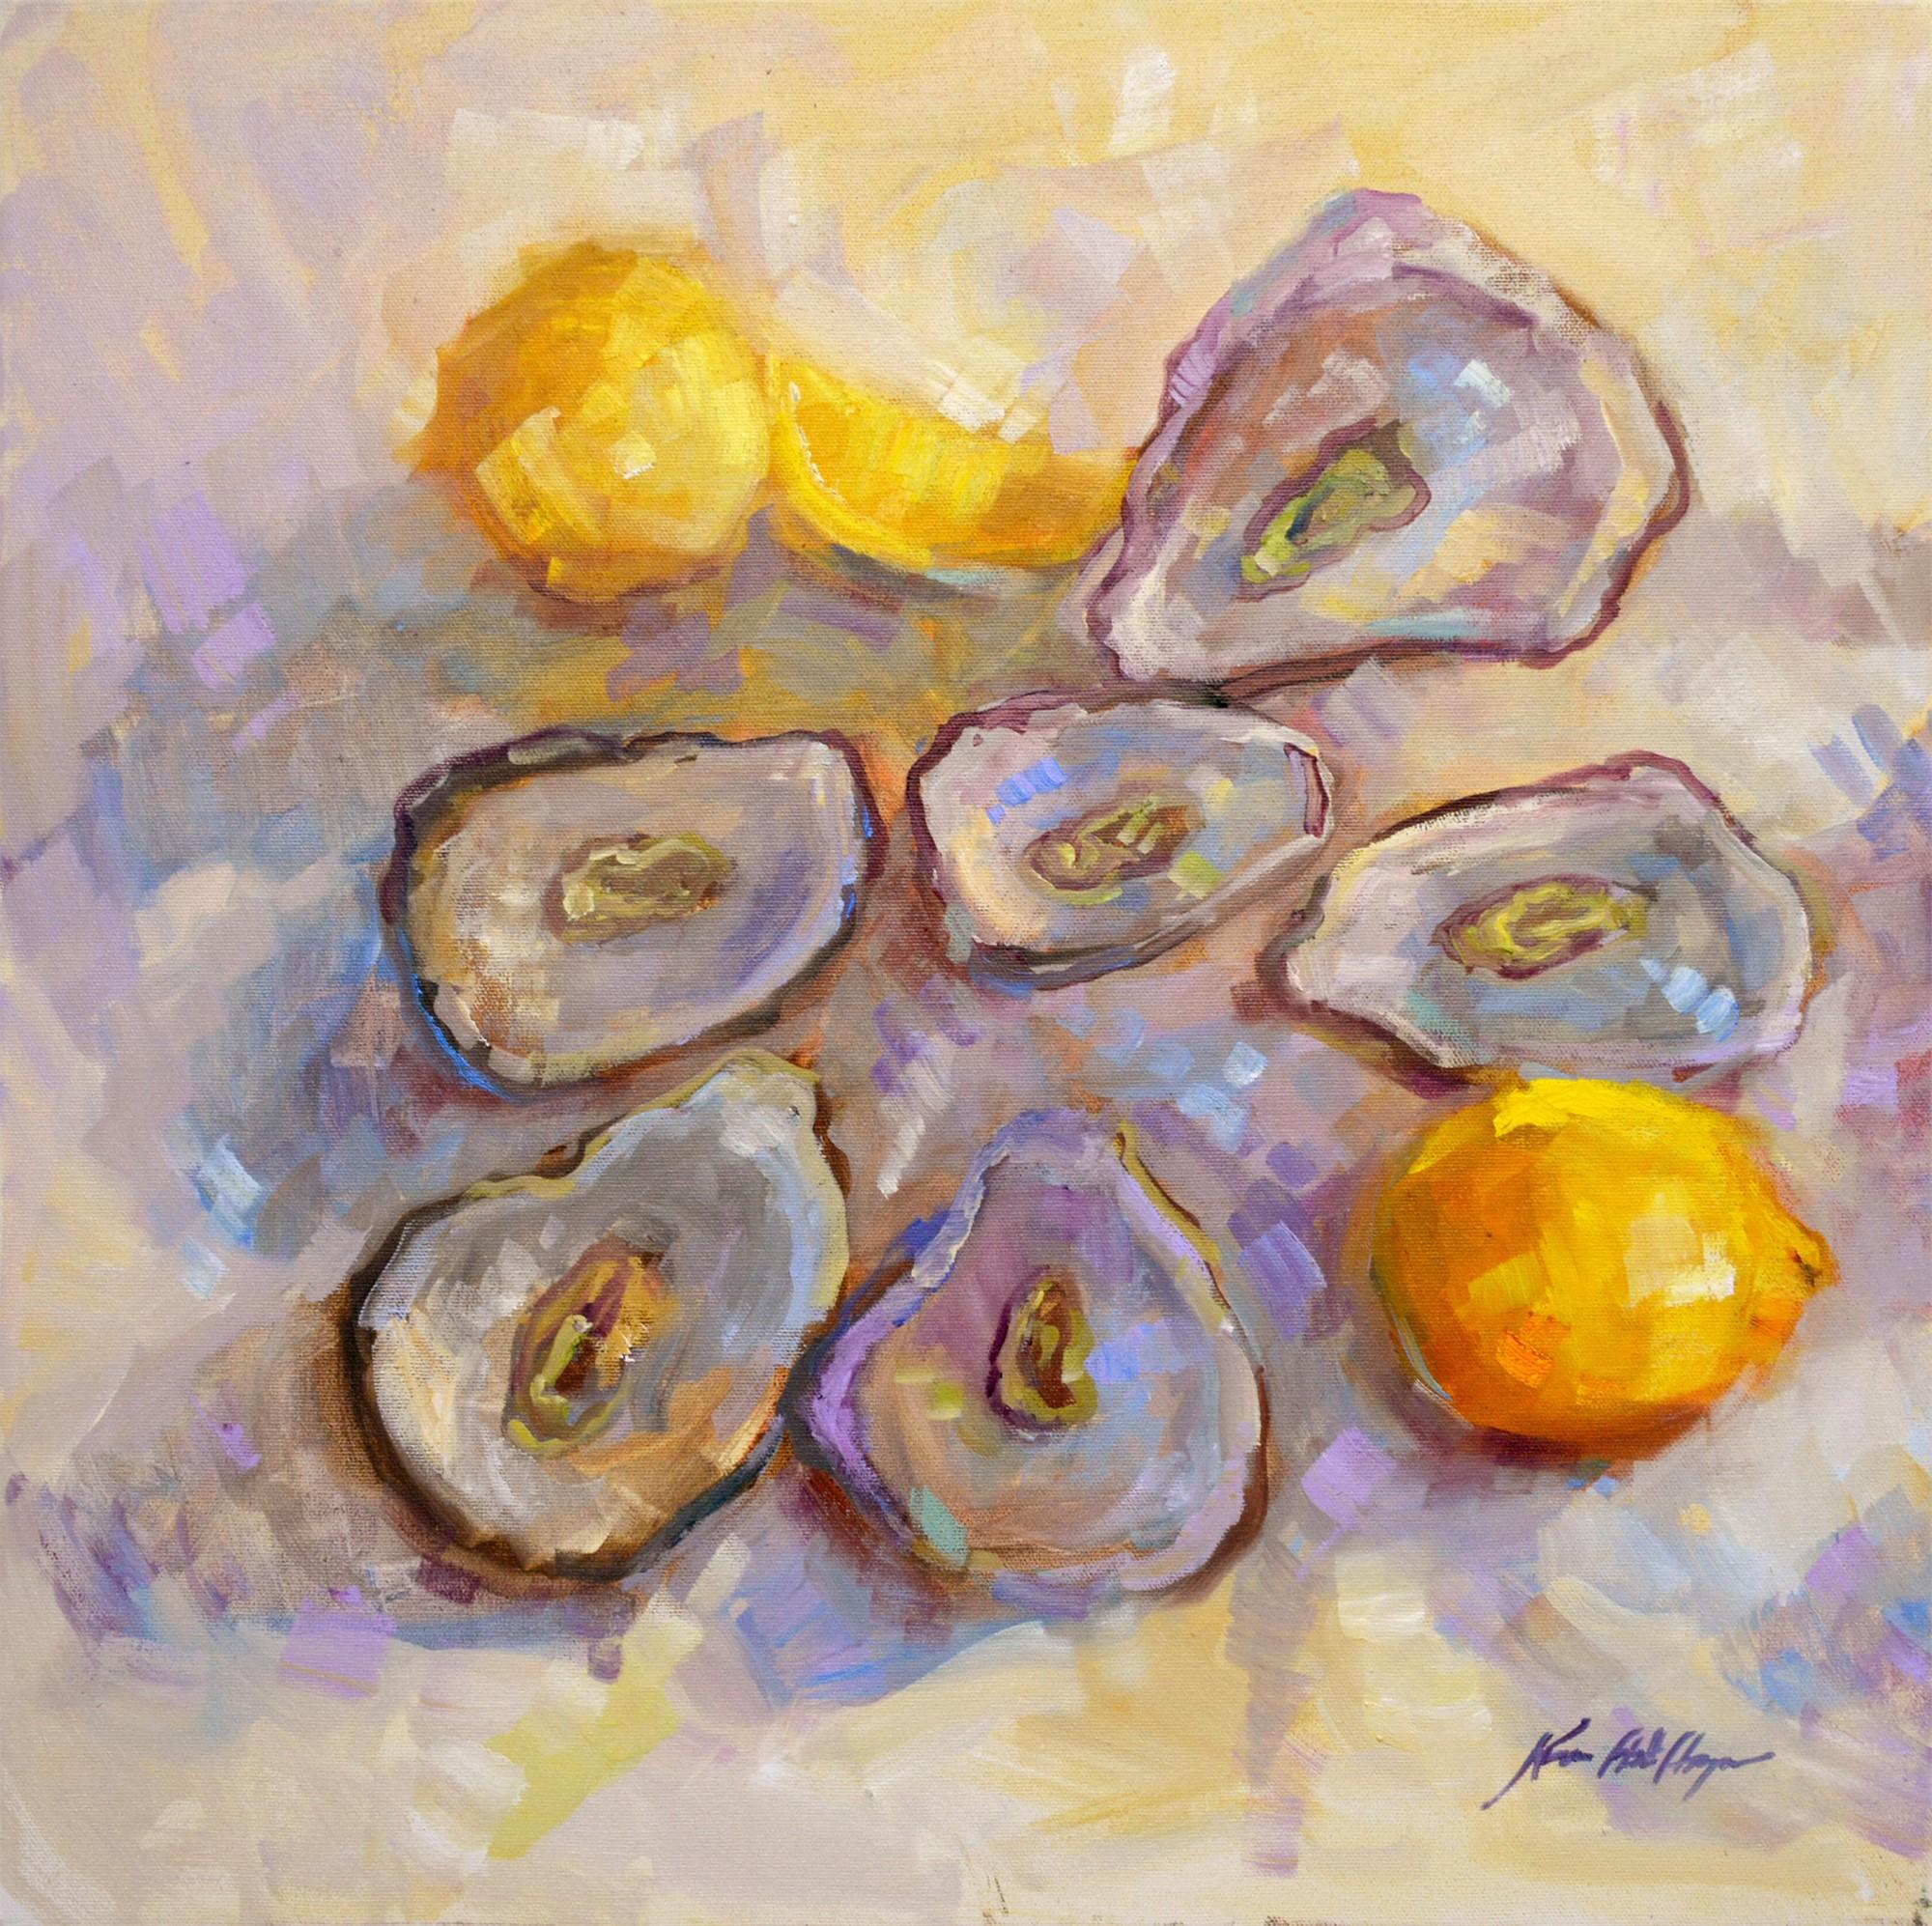 Six Oysters on a Thursday Night by Karen Hewitt Hagan